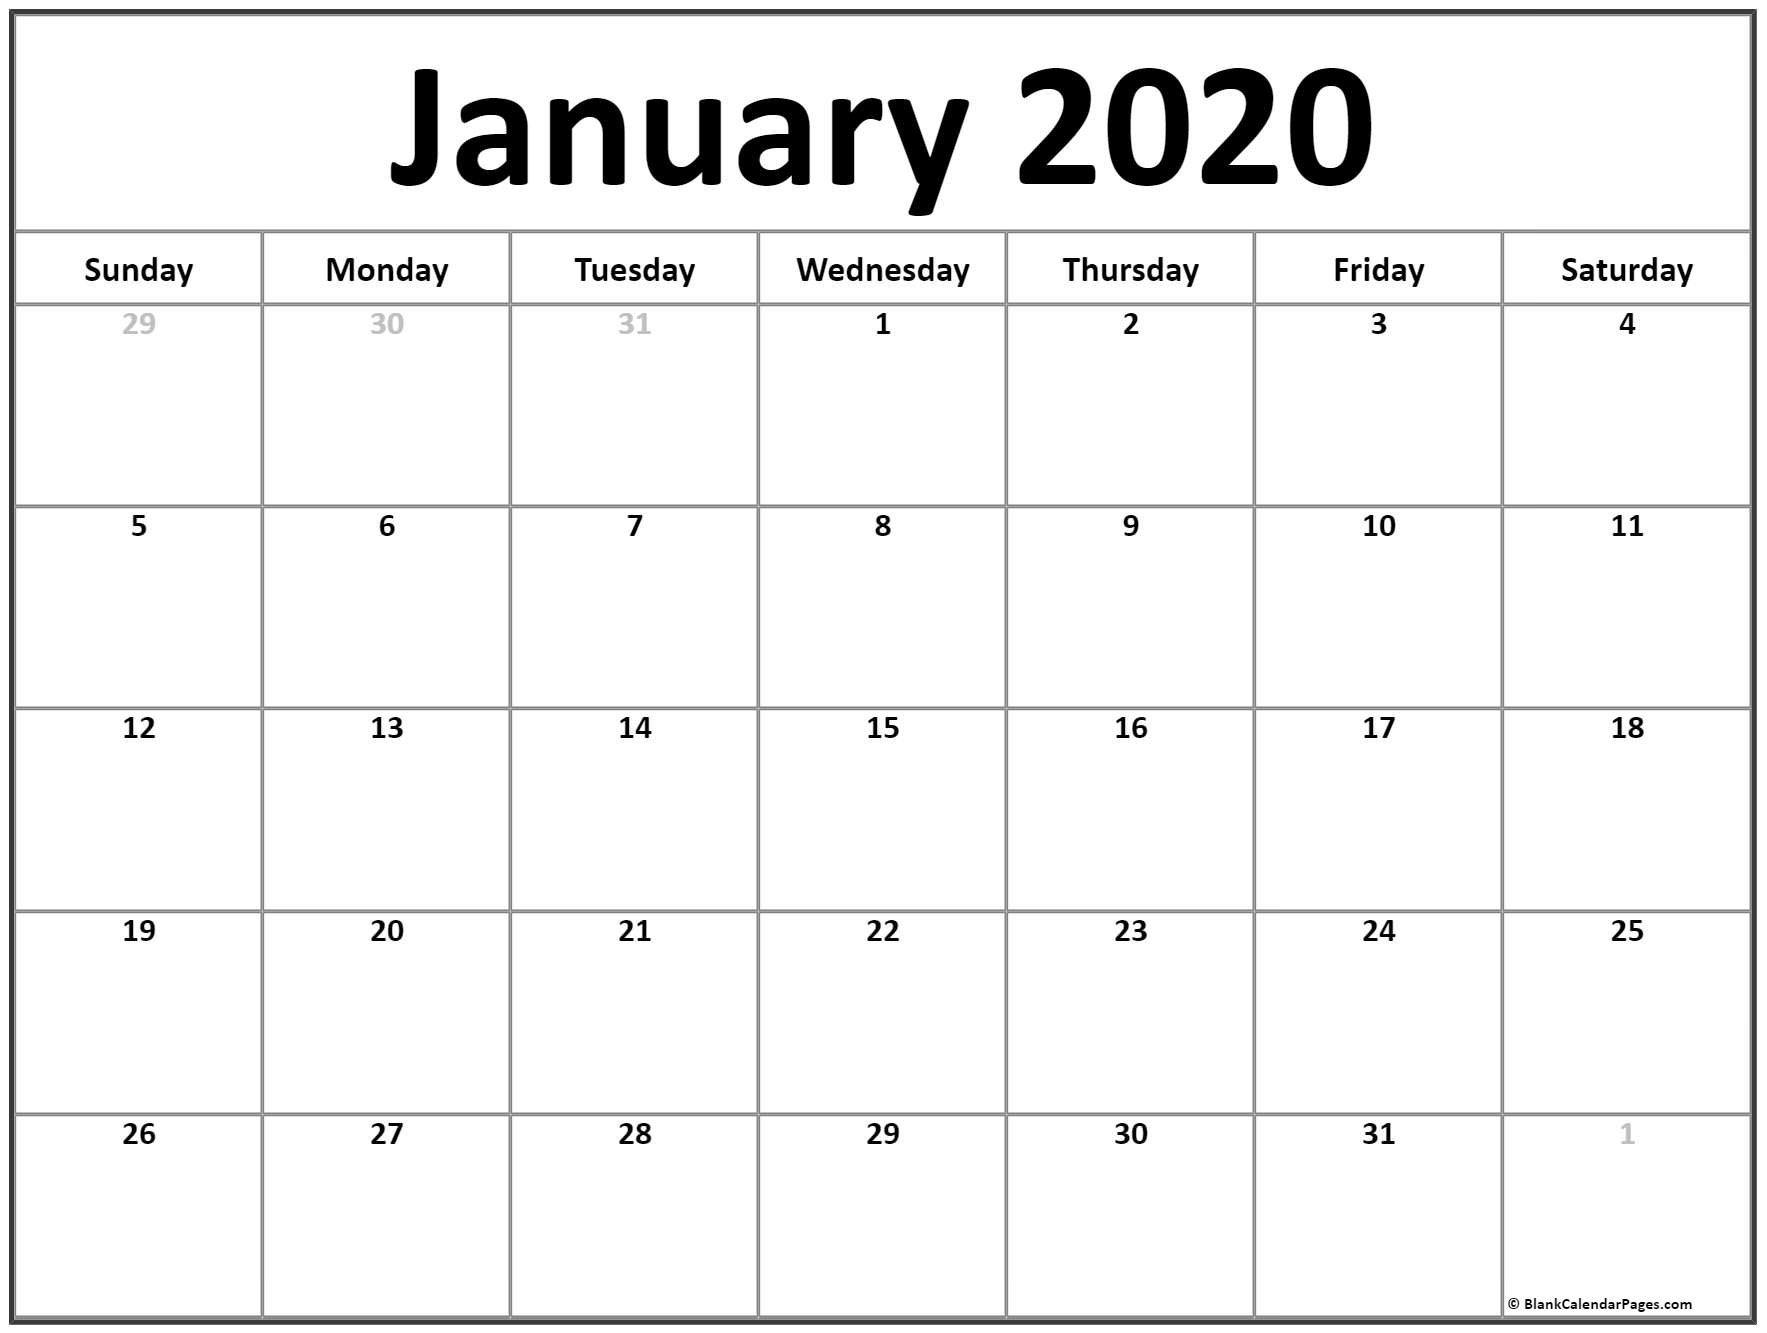 January 2020 Calendar | Free Printable Monthly Calendars Free Blank Calendar Page